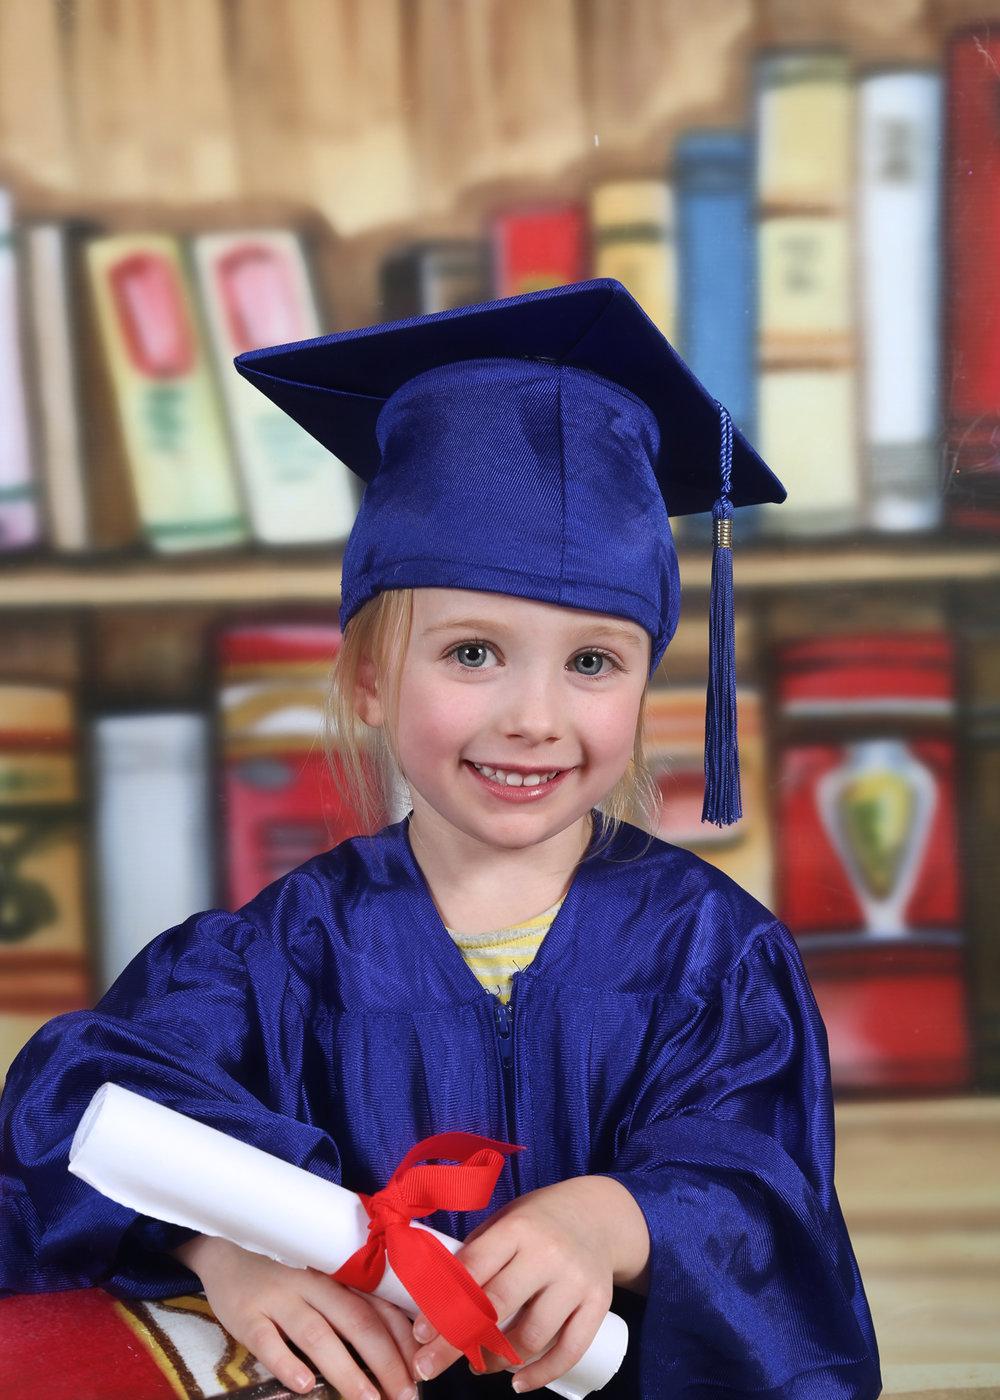 zigzag-zig-zag-photography-graduation-shoot-venture-studios-nursery-school-pre-school-photographers